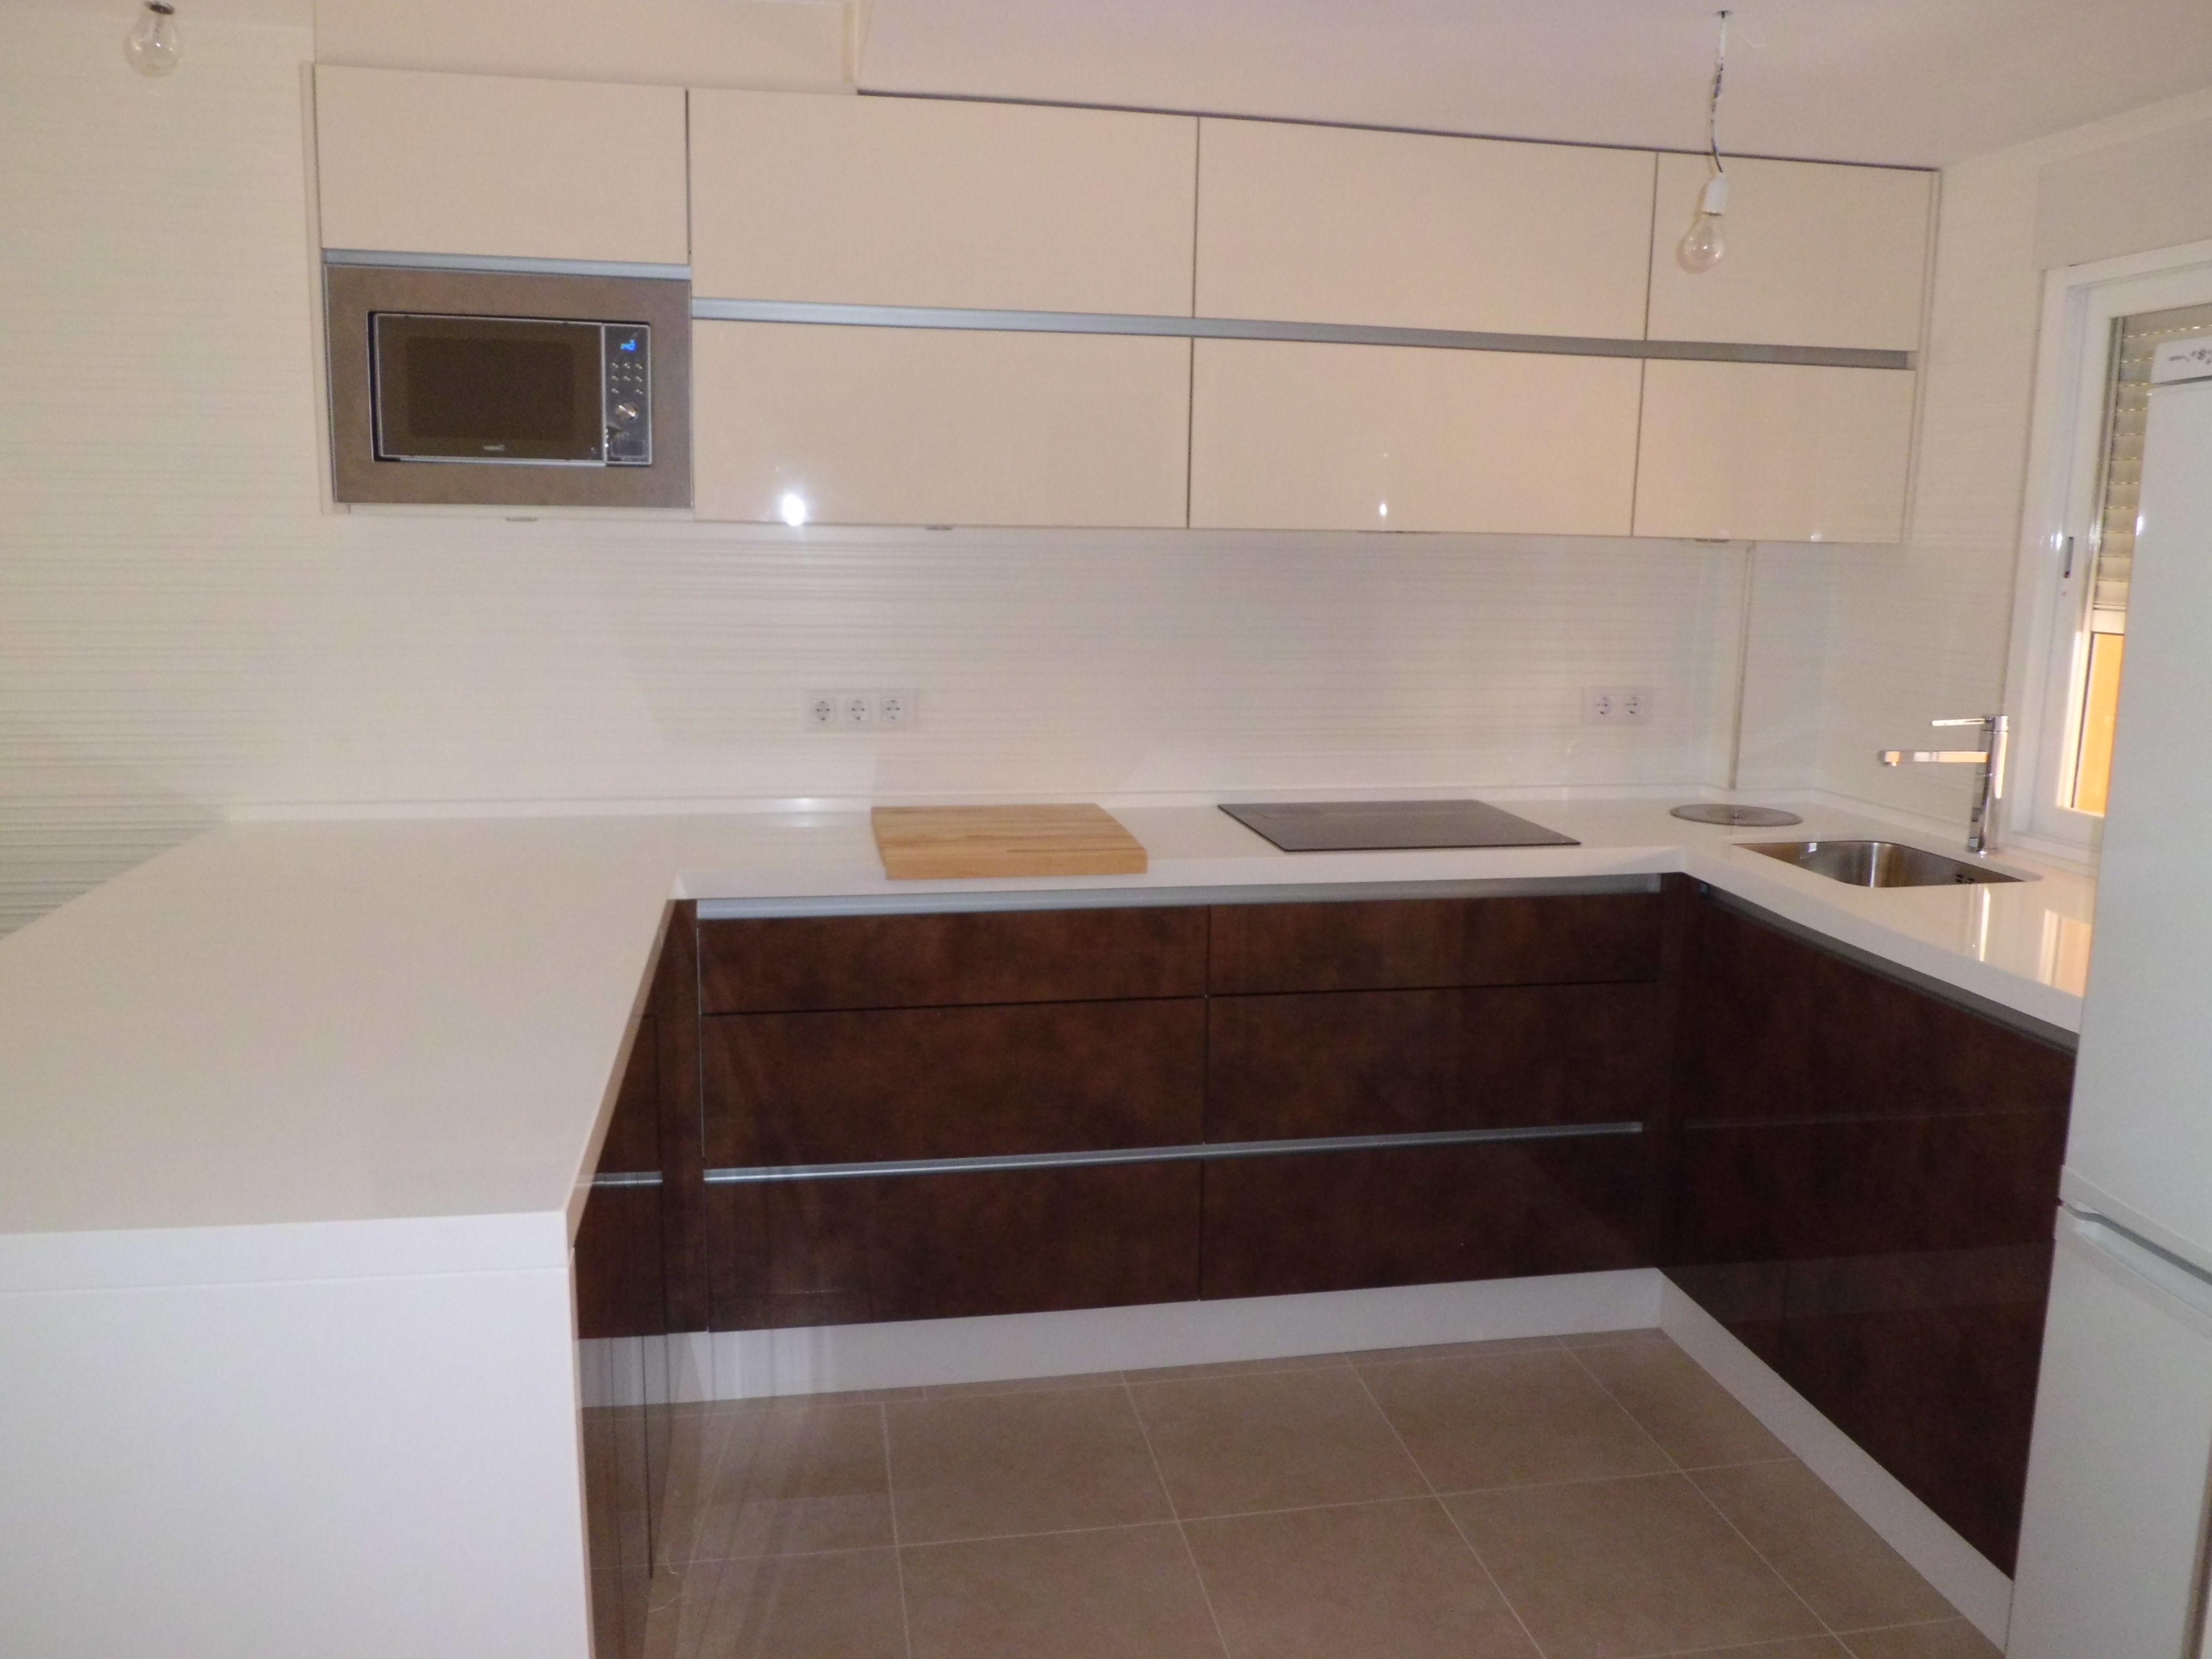 Muebles De Cocina Ebano Granada Azarak Com Ideas Interesantes  # Muebles Molina Granada